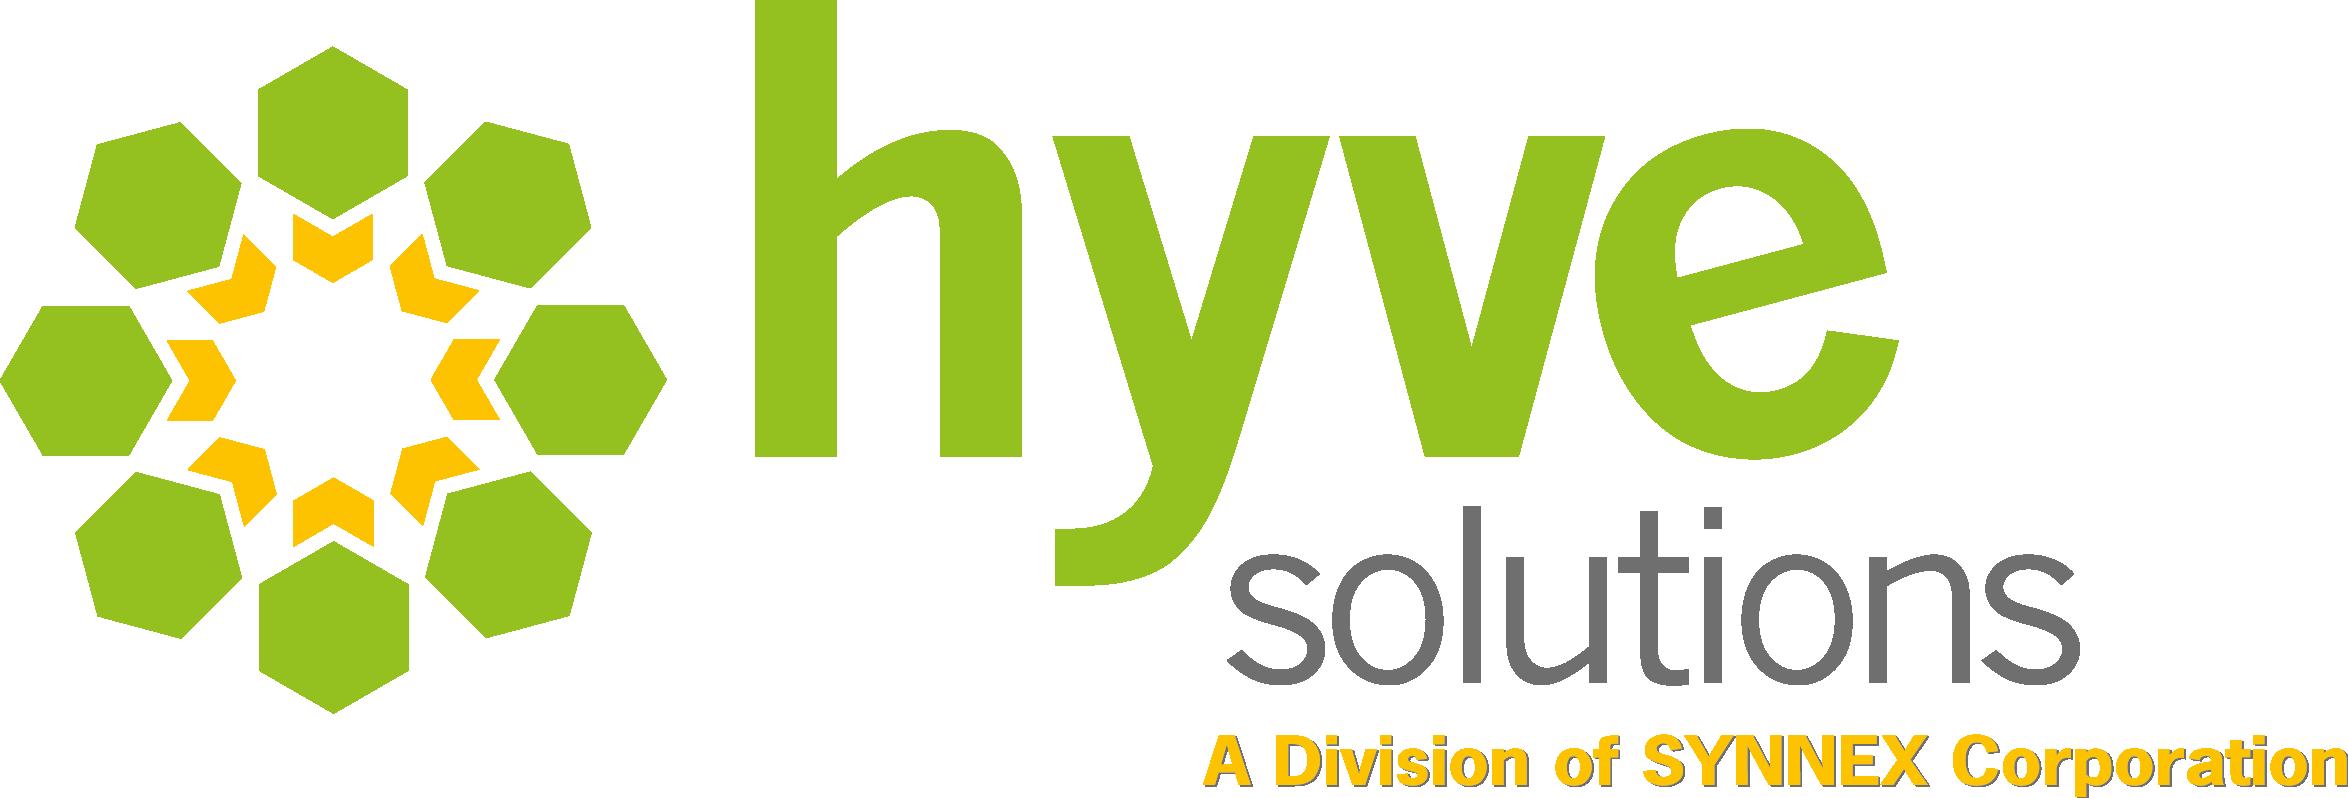 Hyve logo